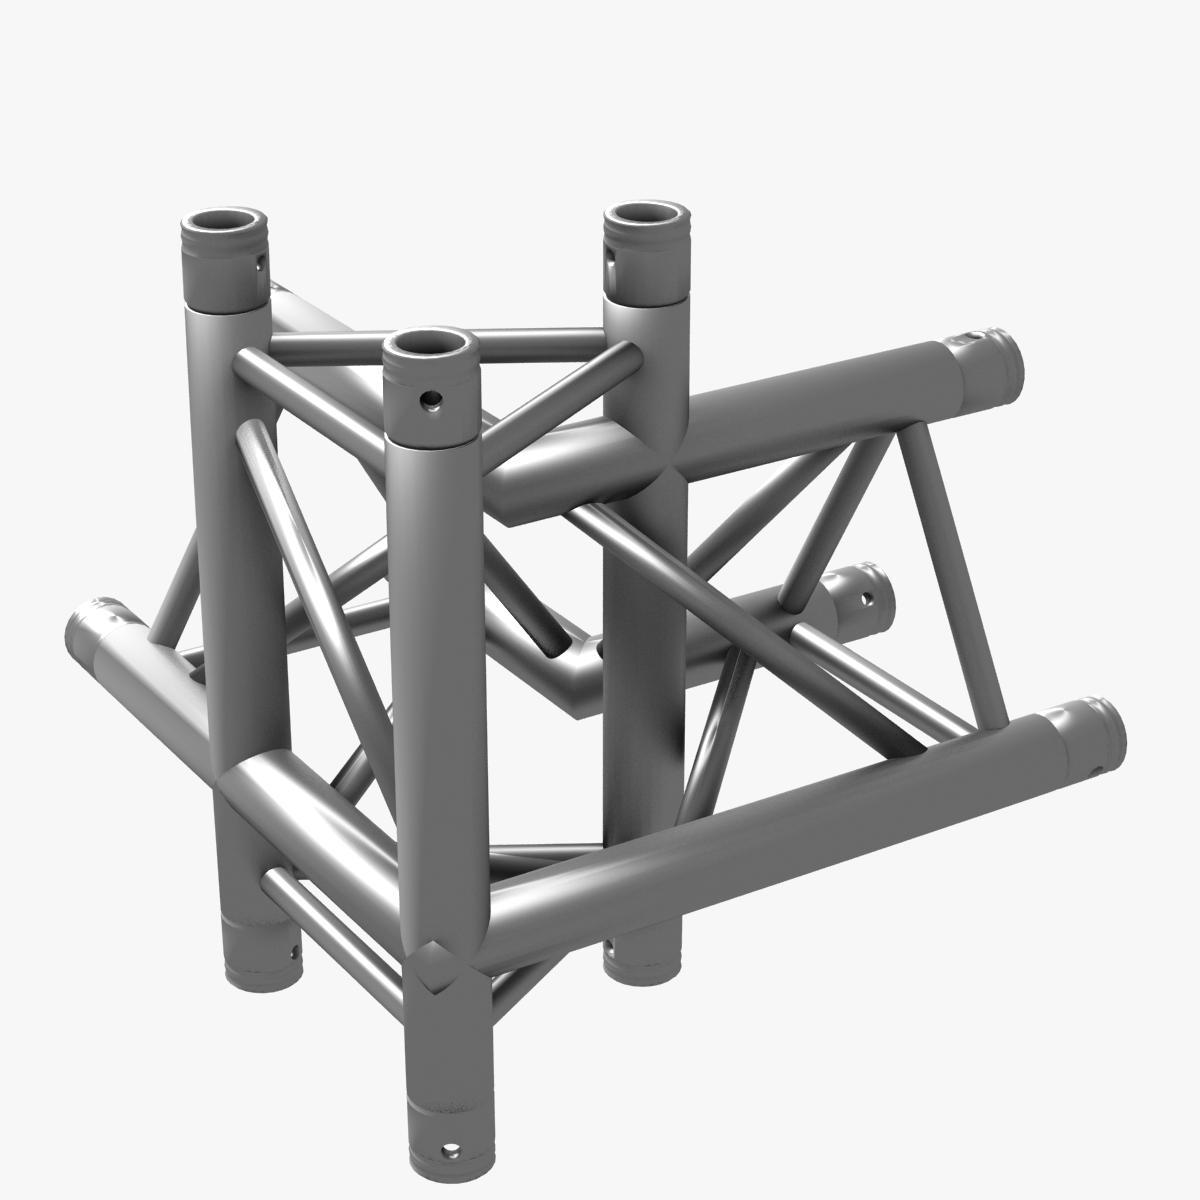 Triangular Truss Corner Junction 102 3d model 3ds max dxf fbx b3d c4d  obj other 268938